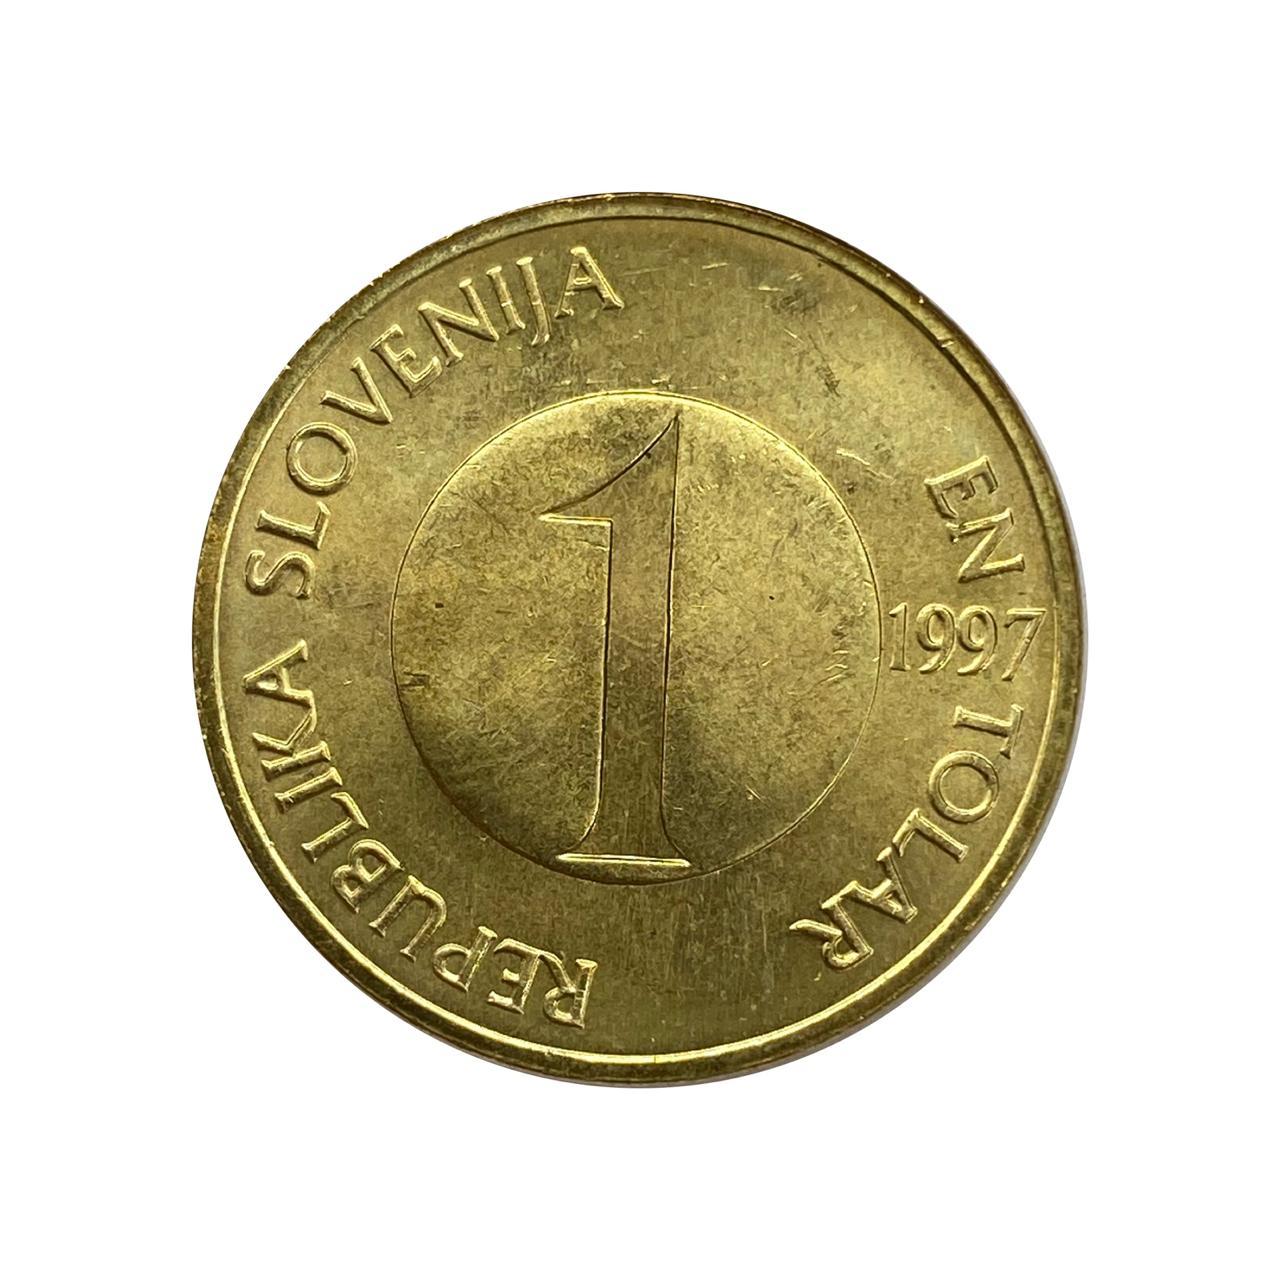 Moeda Eslovênia Fauna 1 Tolar 1997 SOB